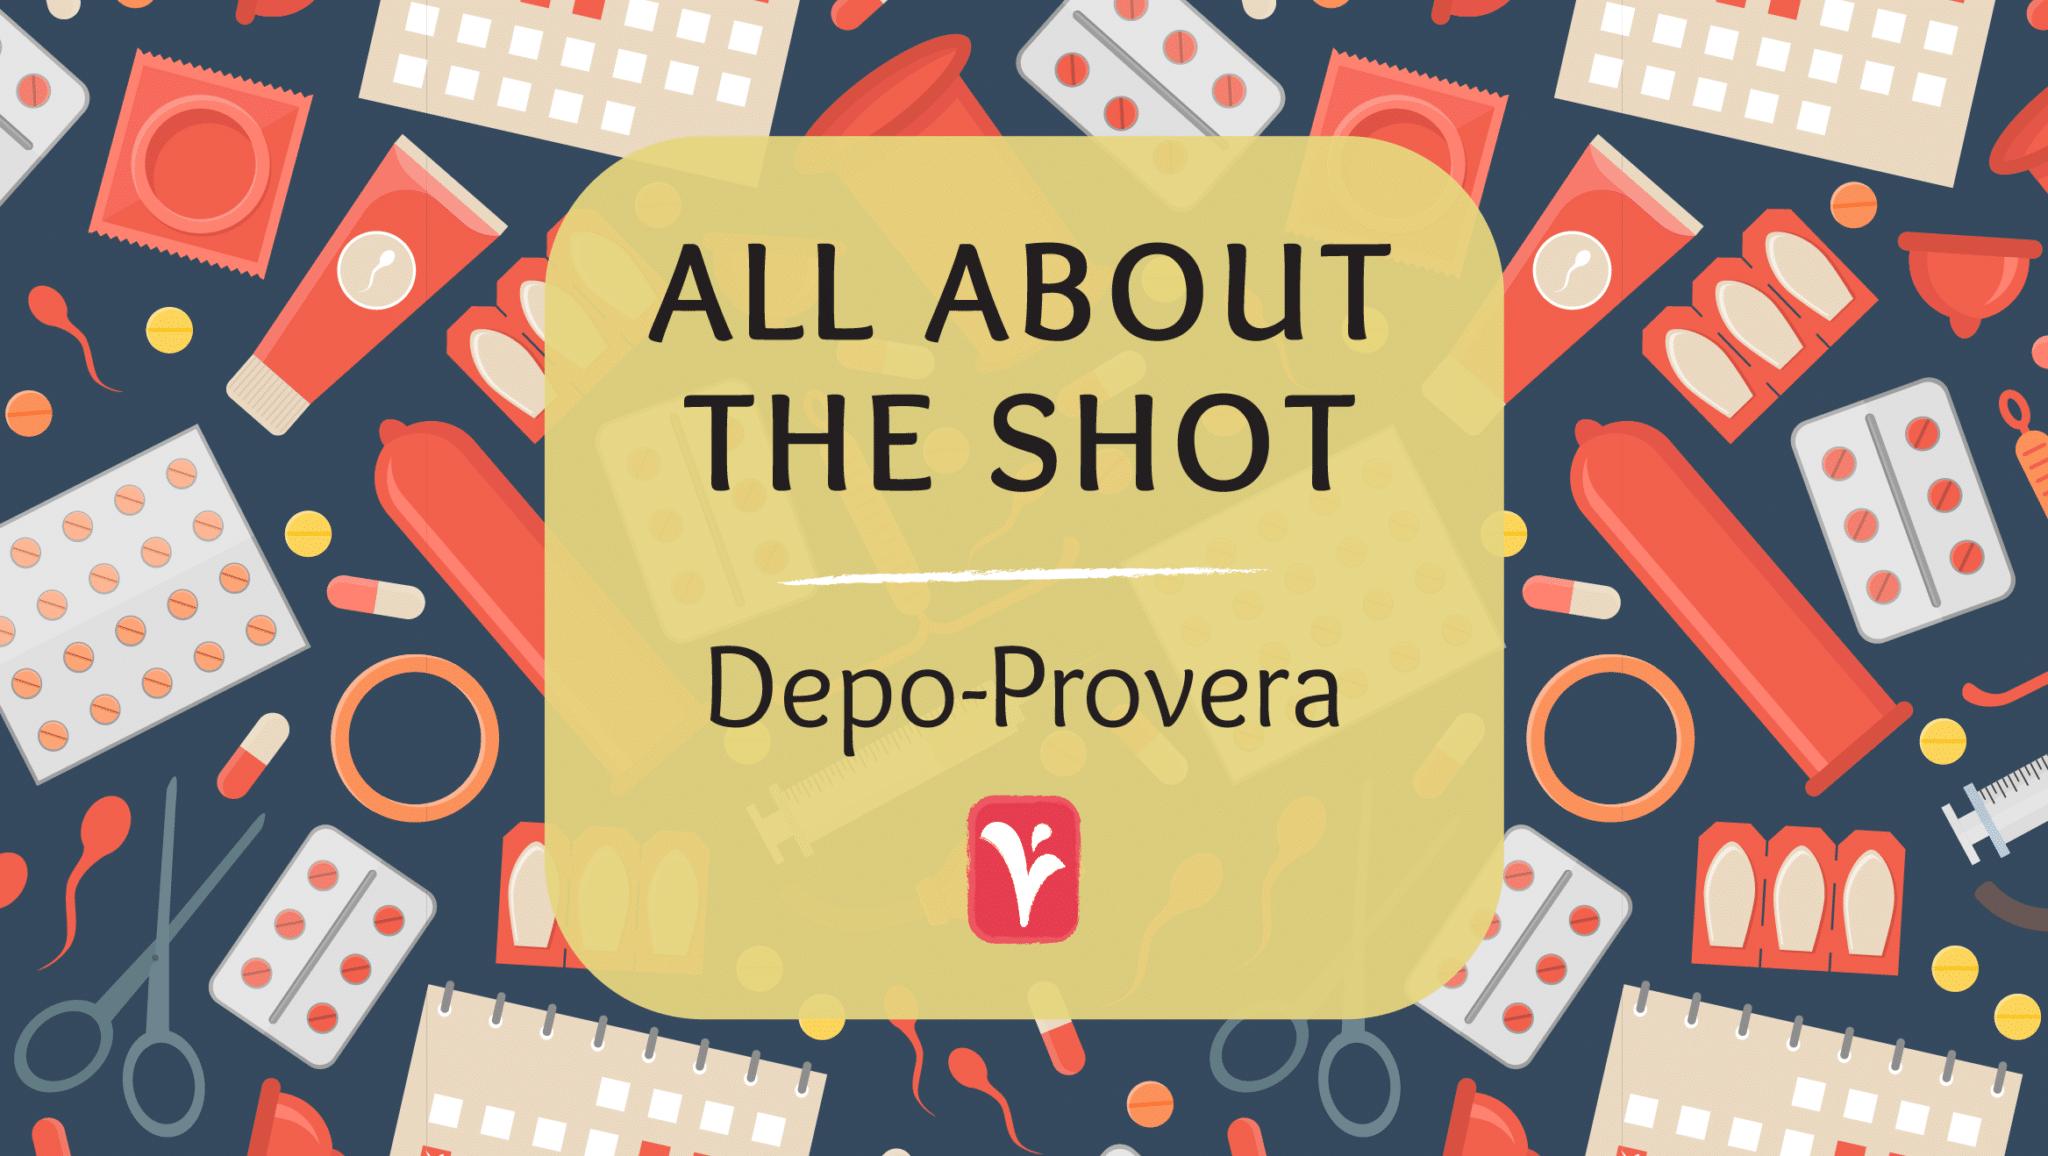 depo shot